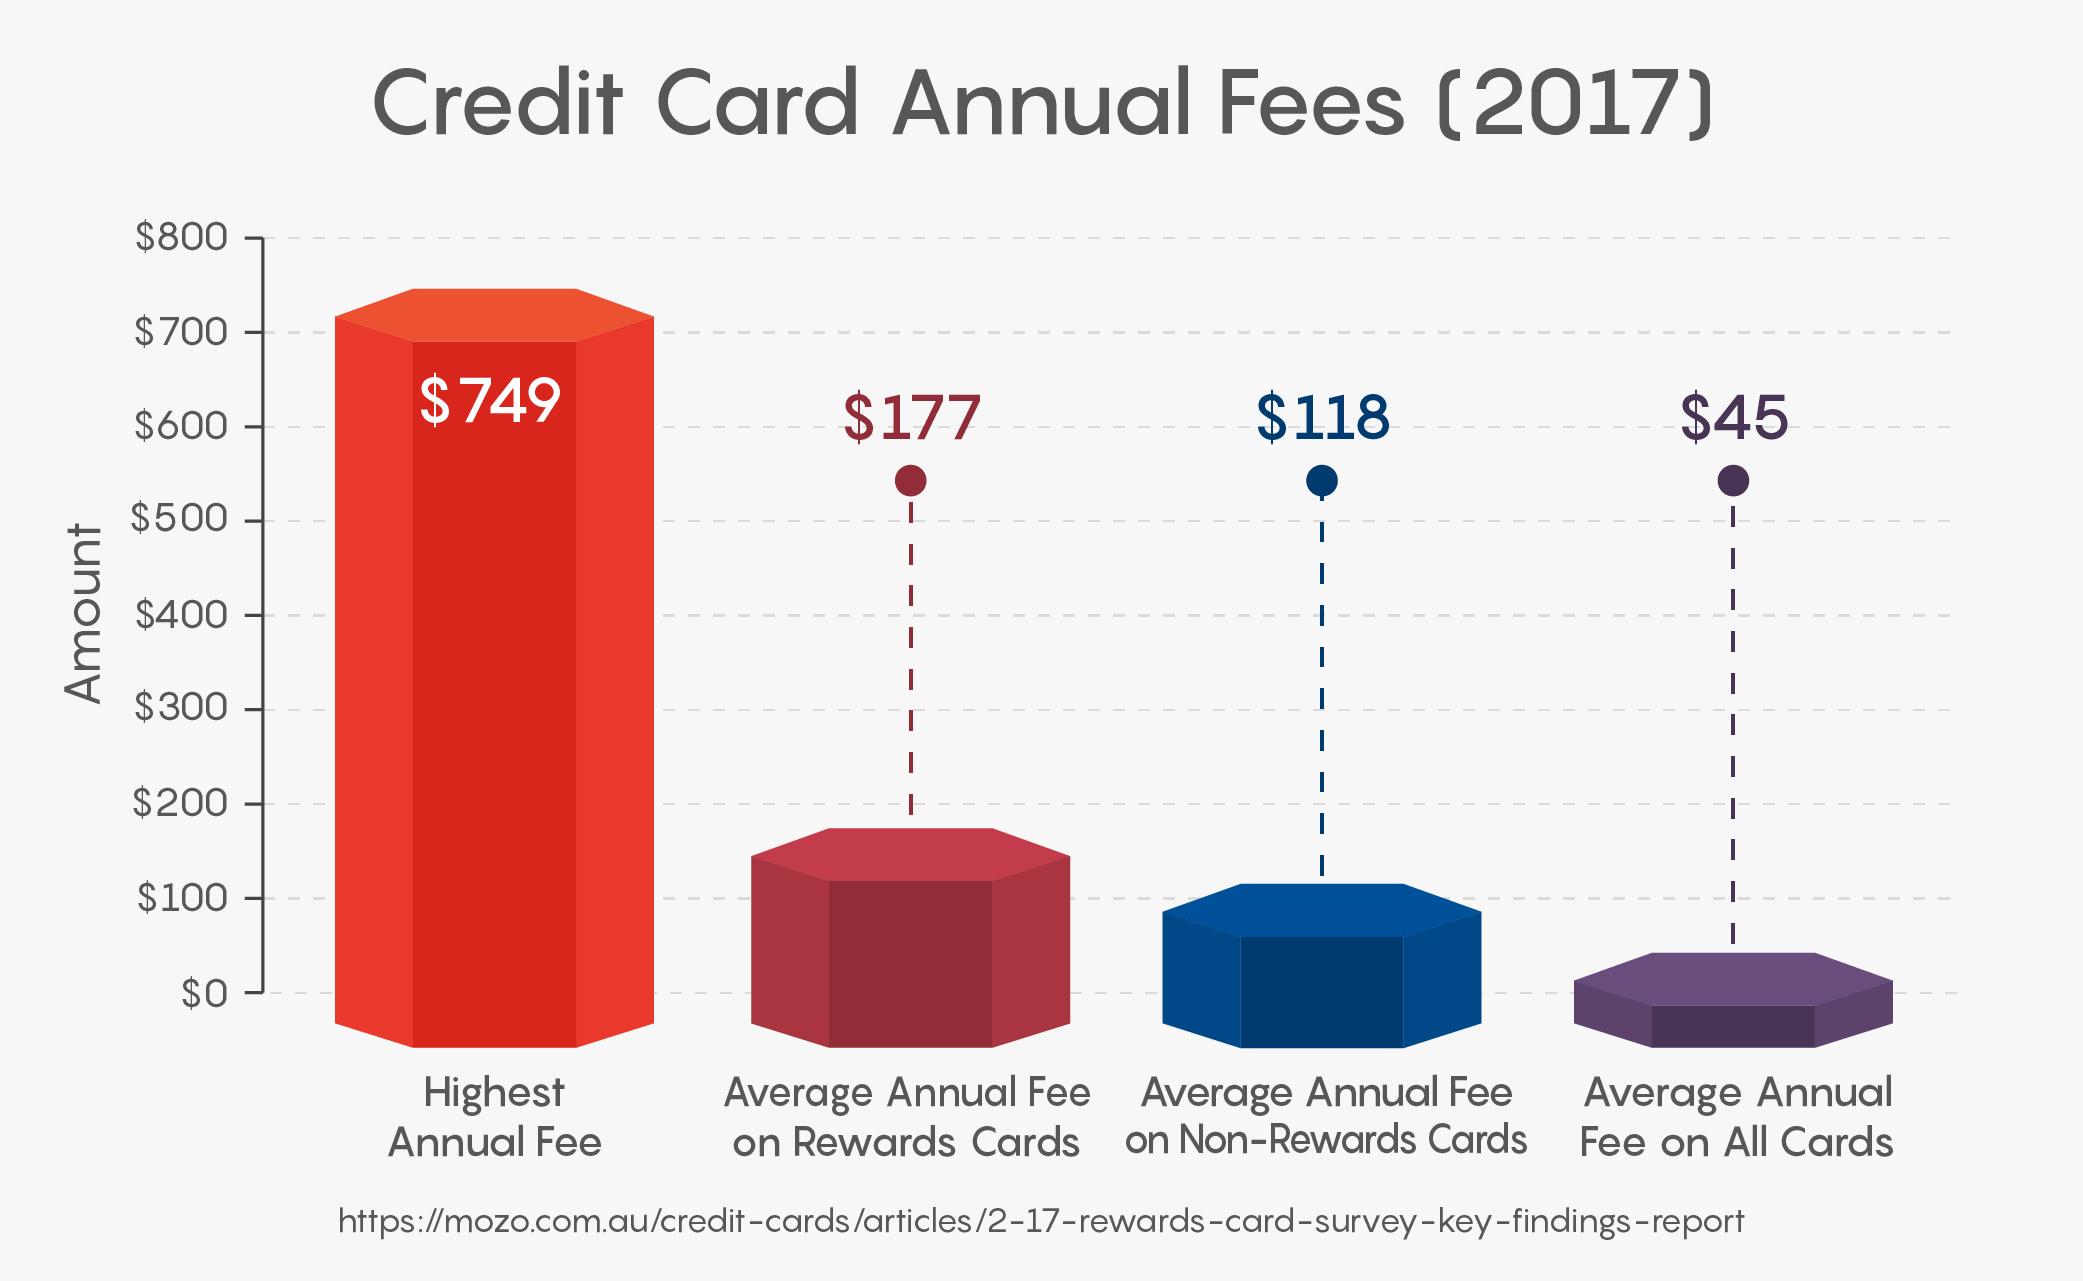 Credit Card Annual Fees (2017)